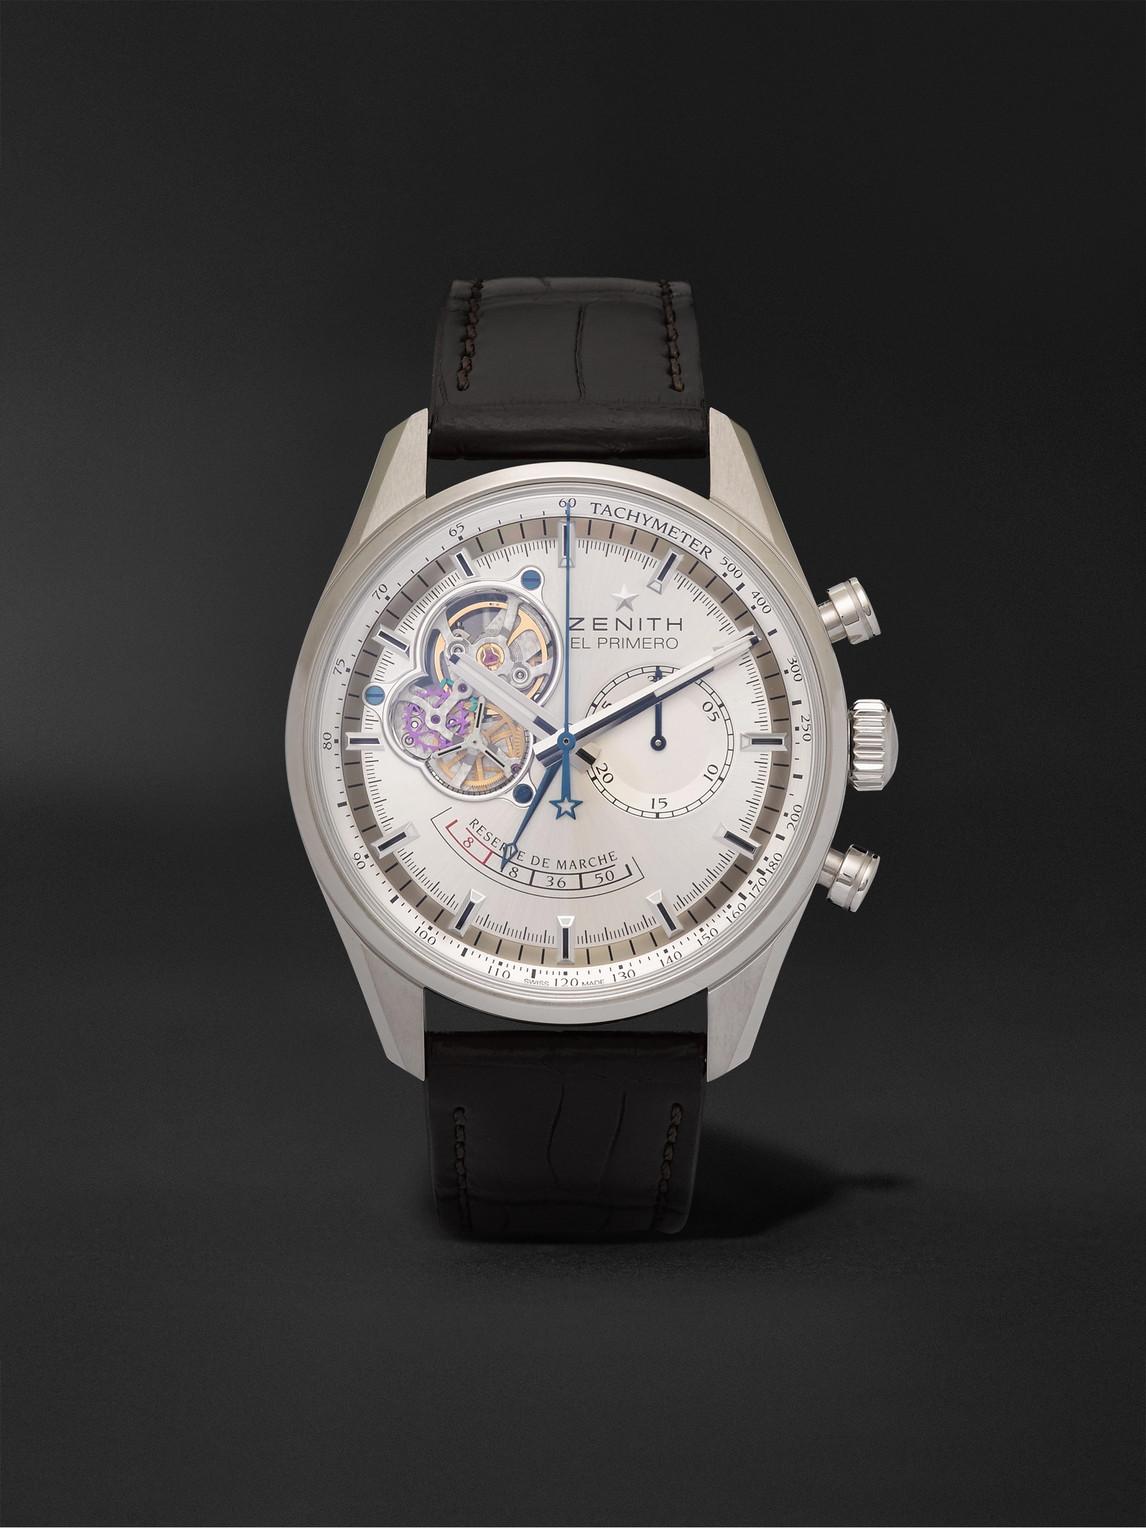 Zenith El Primero Chronomaster 42mm Stainless Steel And Alligator Watch, Ref. No. 03.2080.4021/01.c494 In Silver